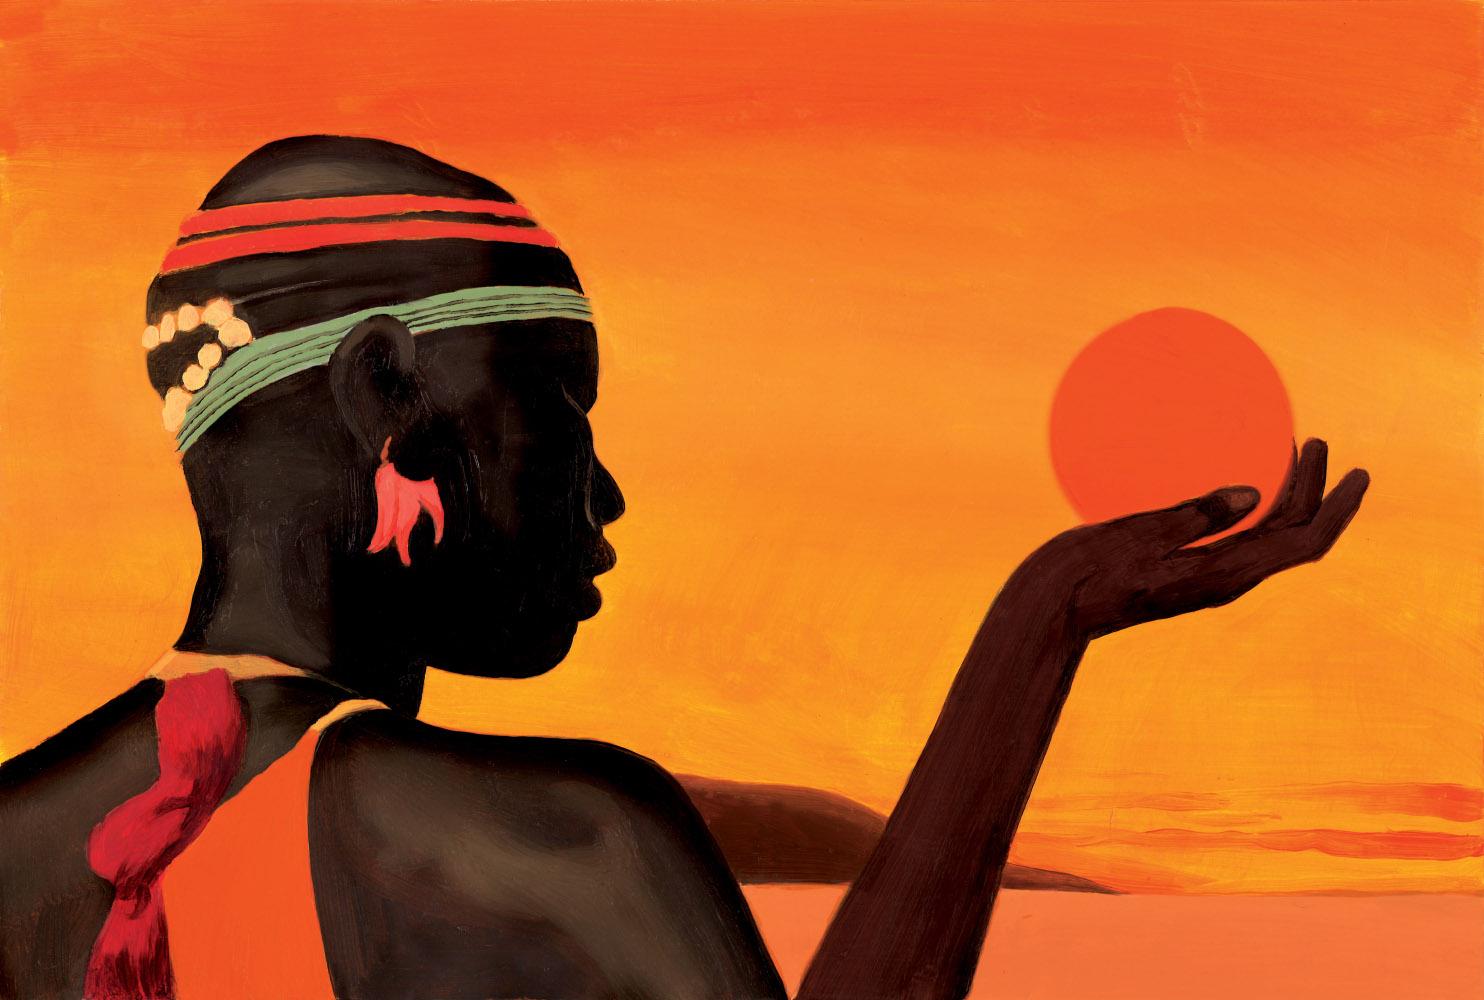 David_H_2019_LA VANGUARDIA_Africa (02)